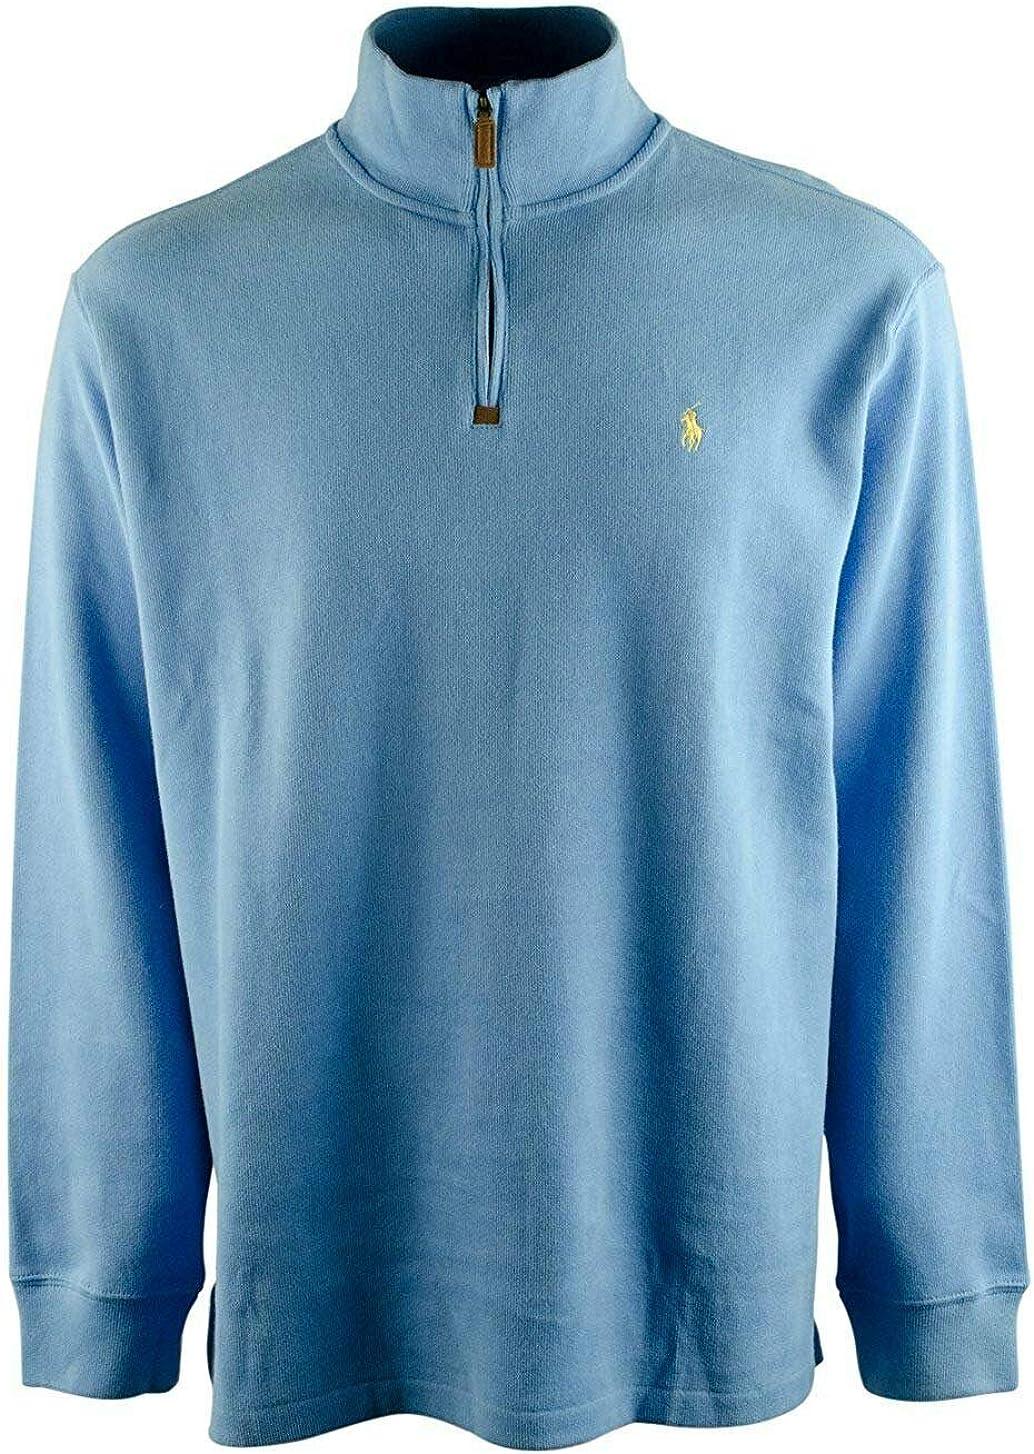 Polo Ralph Lauren Men's Half Zip French Rib Cotton Sweater (Small, Grey Heather/Navy Pony)